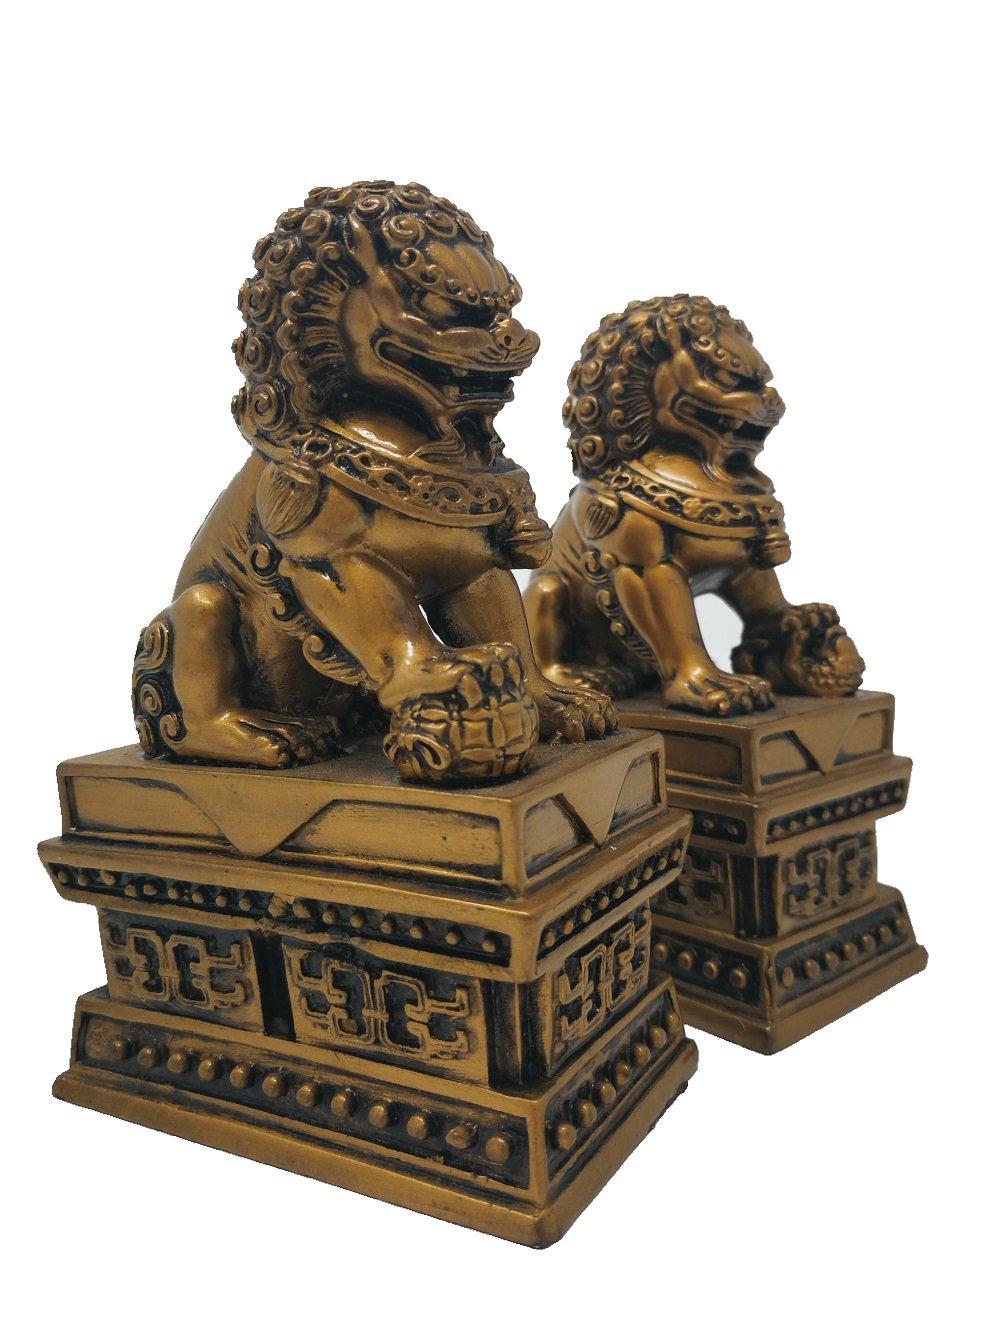 Wenmily Wealth Porsperity Pair of Fu Foo Dogs Guardian Lion Statues,Best Housewarming Congratulatory to Ward Off Evil Energy,Feng Shui Decor